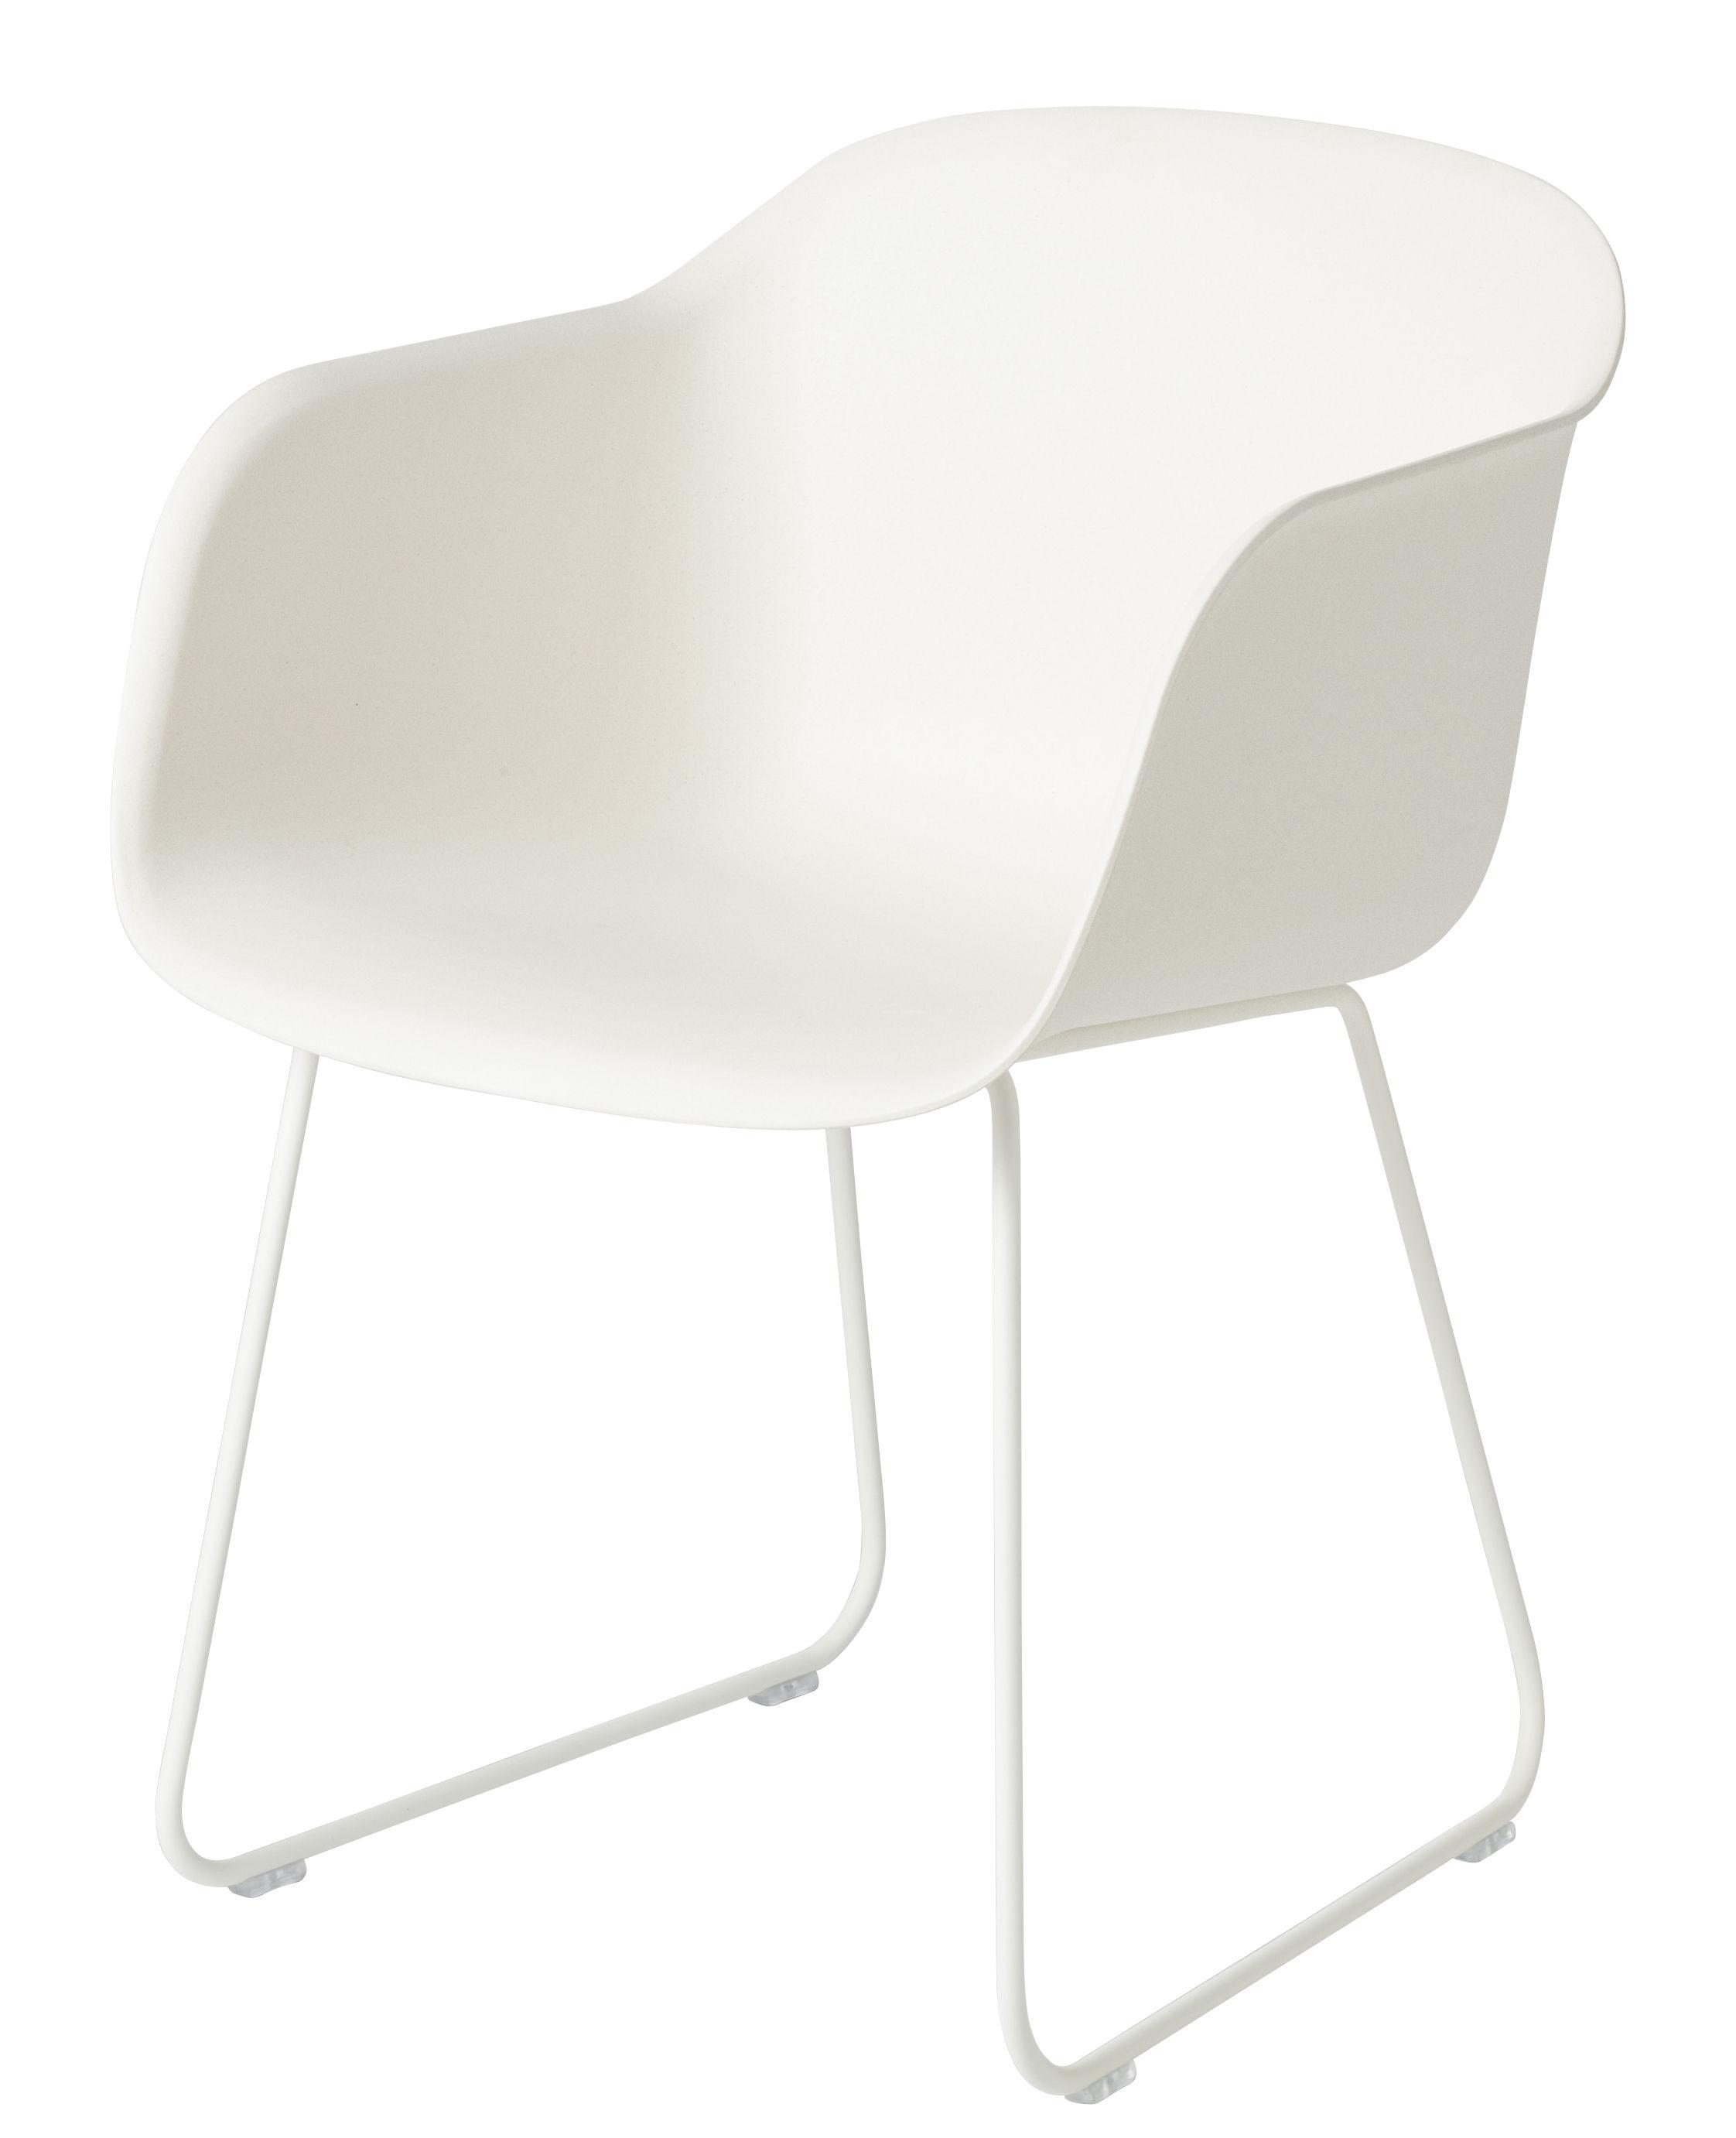 Arredamento - Sedie  - Poltrona Fiber - / Base a cavalletto di Muuto - Bianca / Base bianca - Acciaio verniciato, Matériau composite recyclé